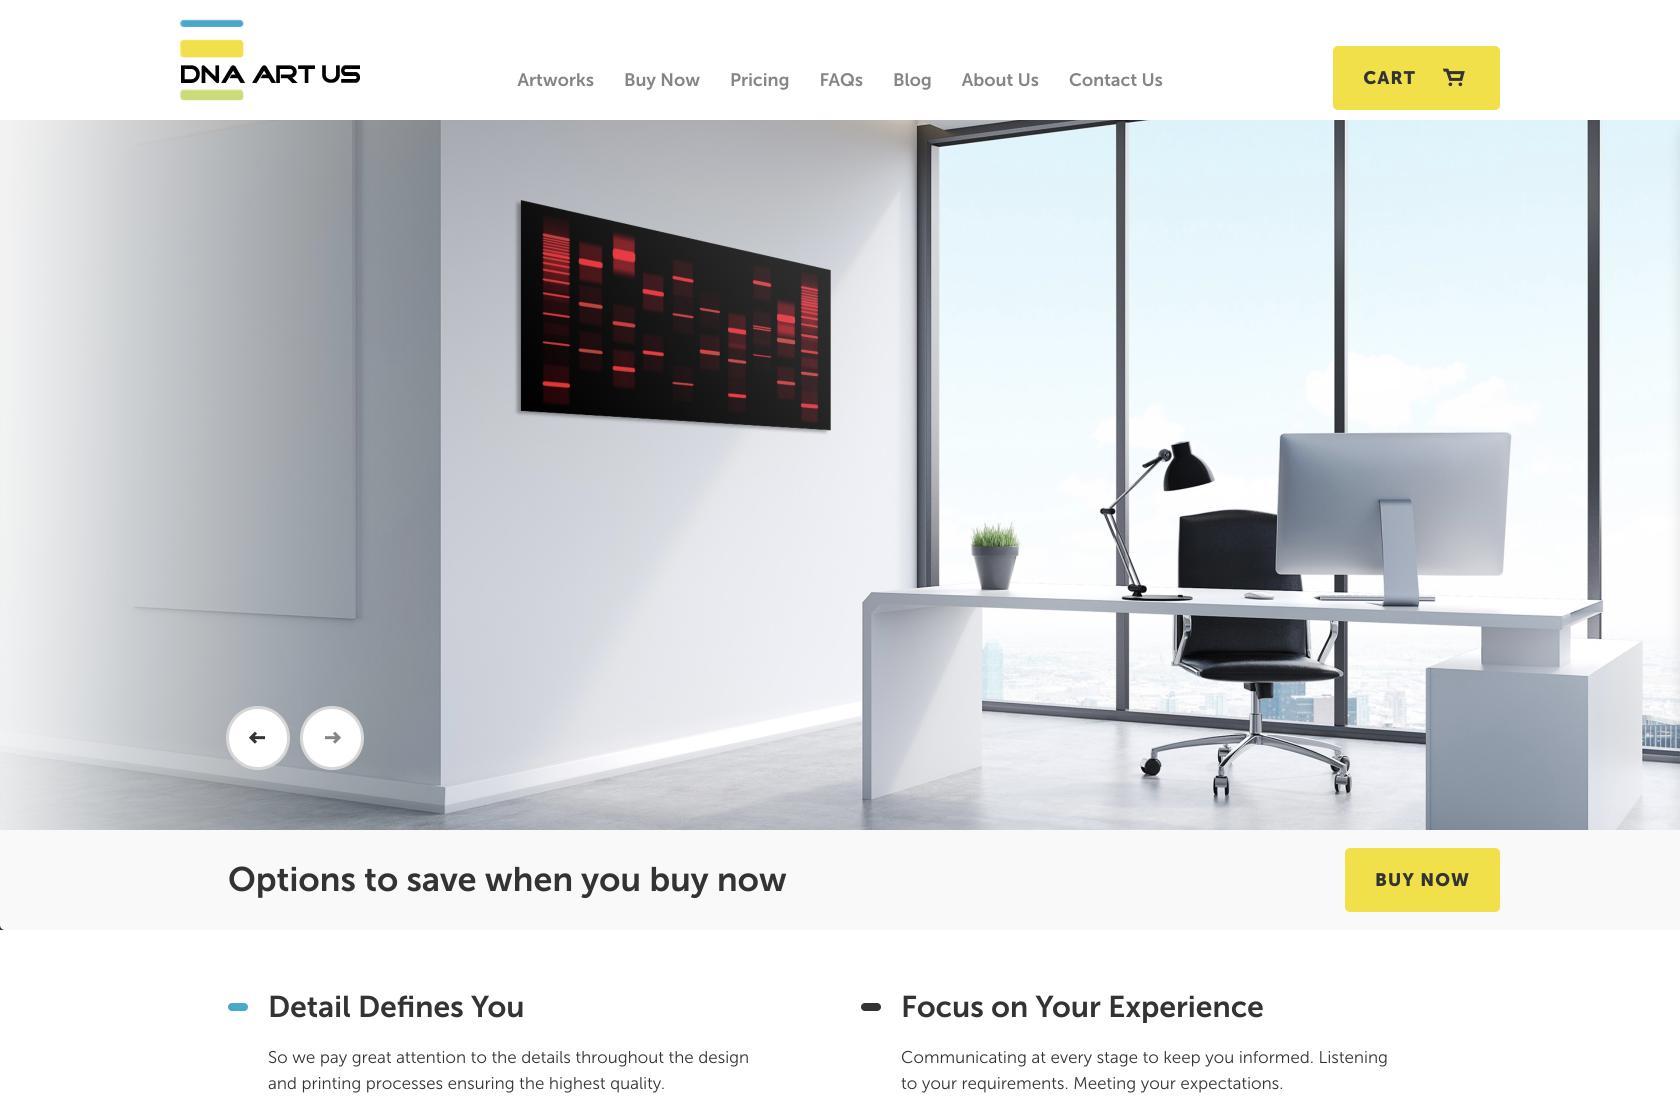 DNA Art US homepage design on desktop